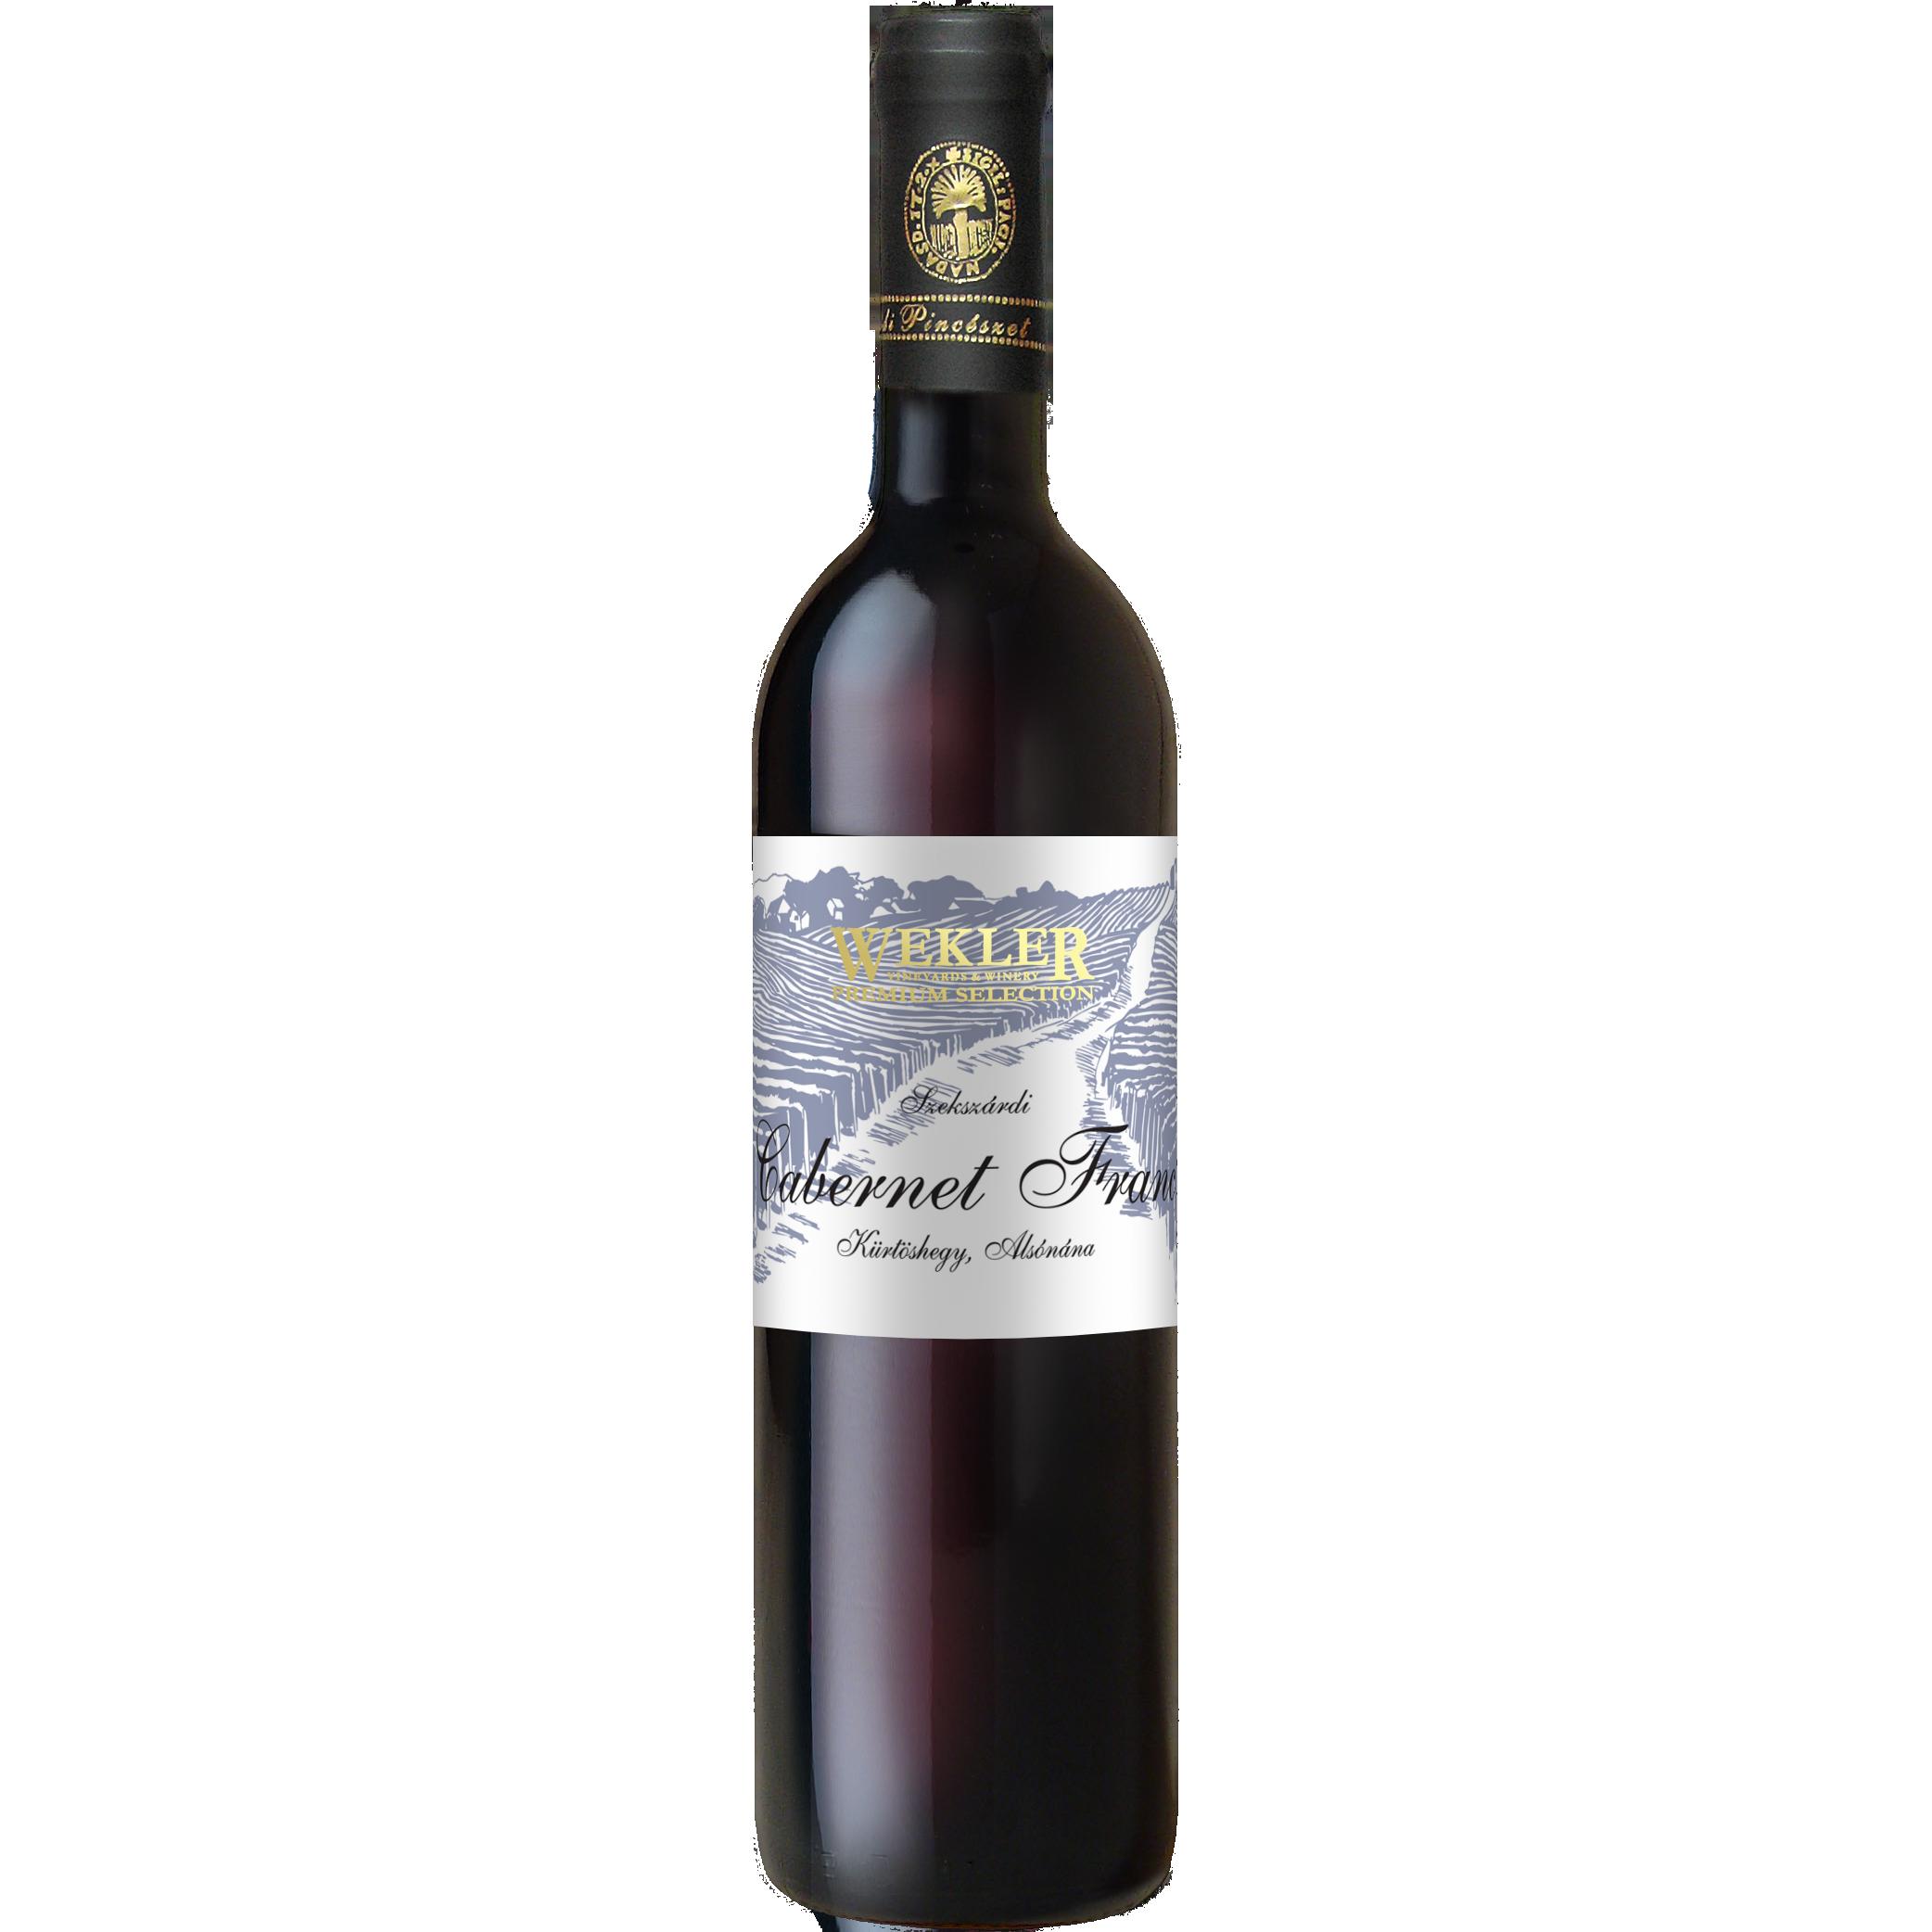 wekler-szekszardi-cabernet-franc-2008-premium-selection